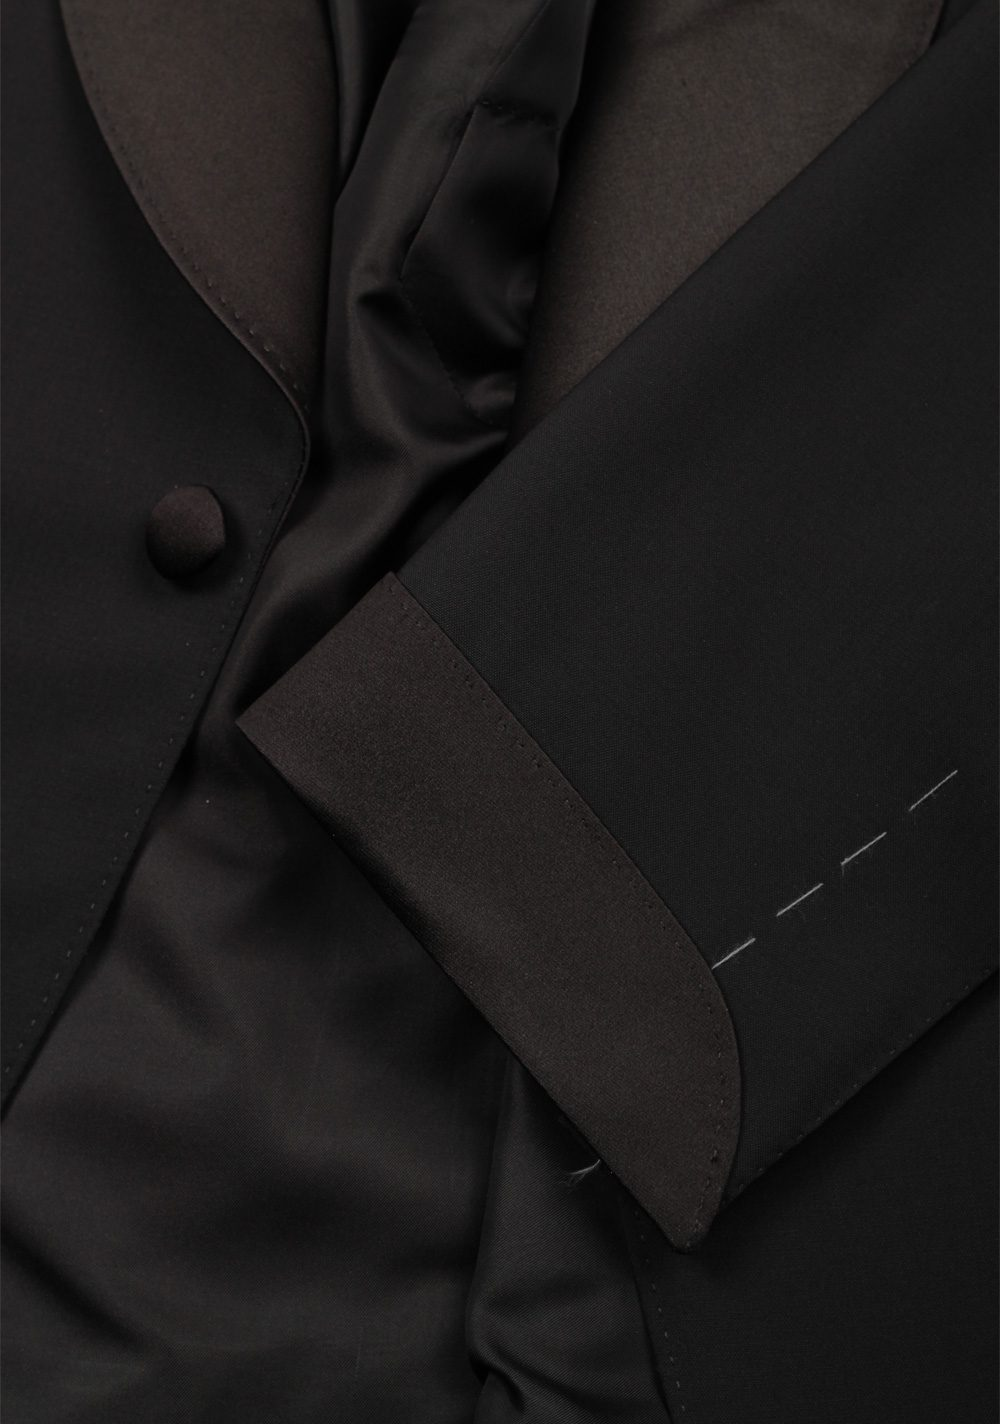 TOM FORD Shelton Black Tuxedo Suit Size 52 / 42R U.S. Shawl Collar | Costume Limité